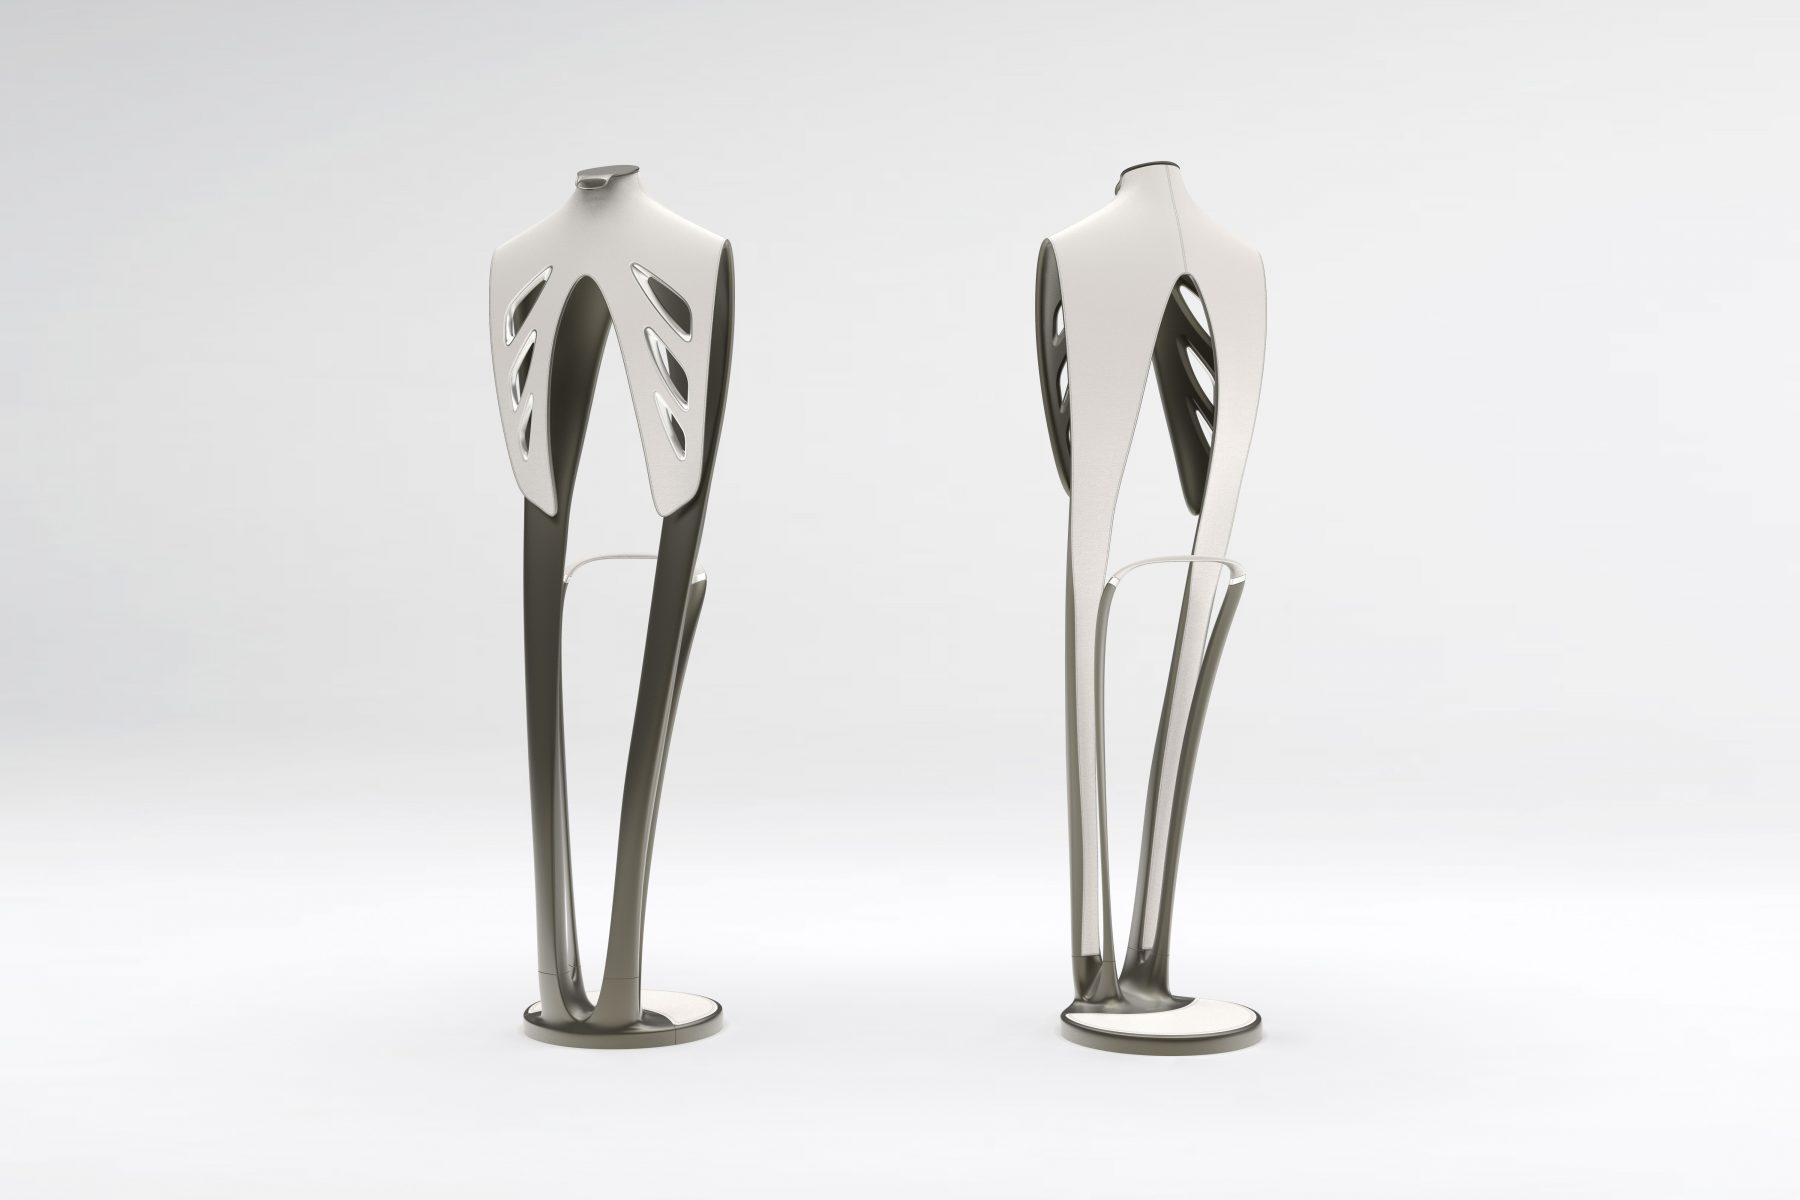 Allure valet stand, design by Julien Bonzom